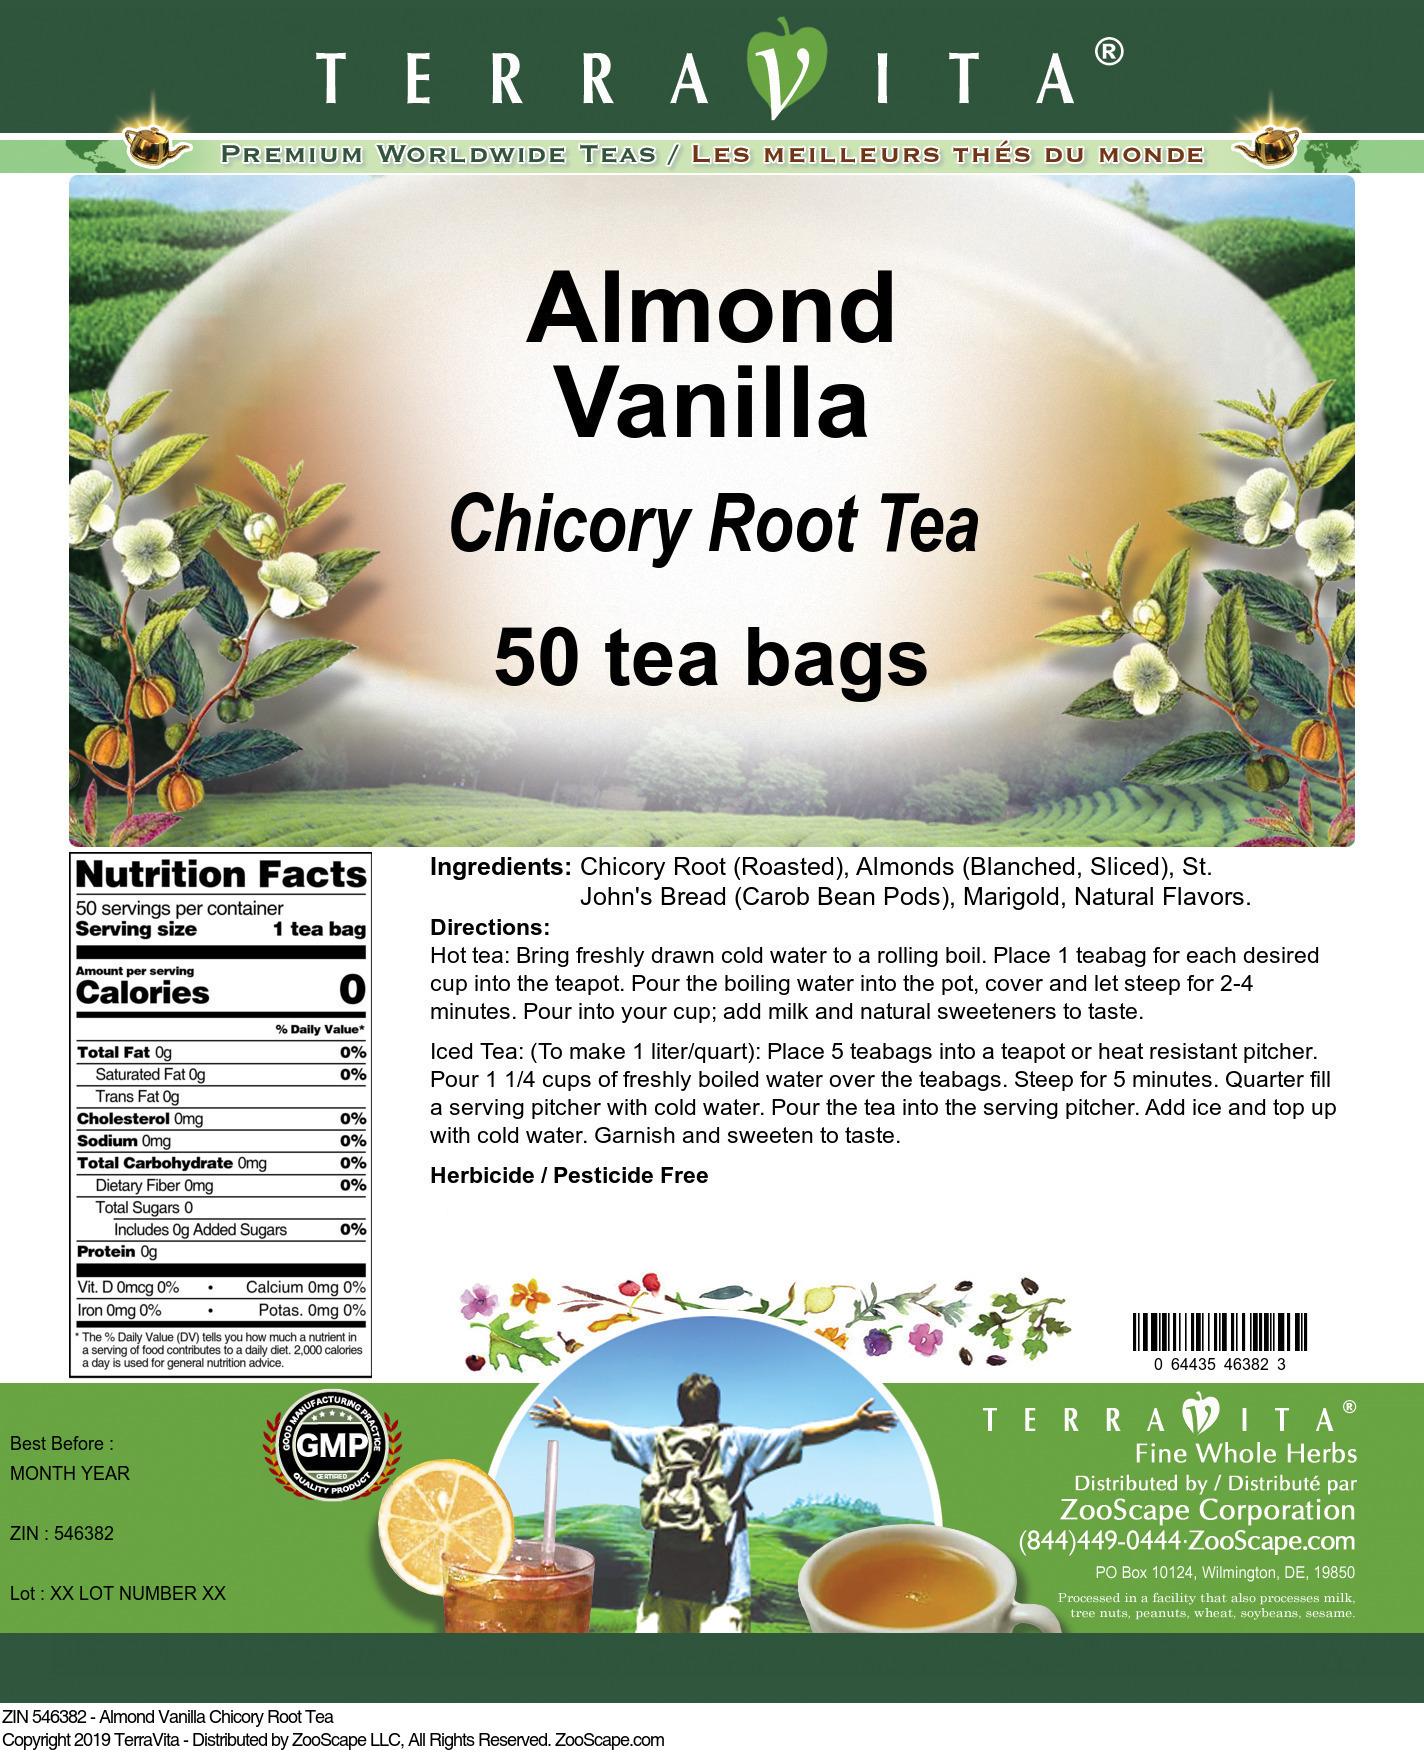 Almond Vanilla Chicory Root